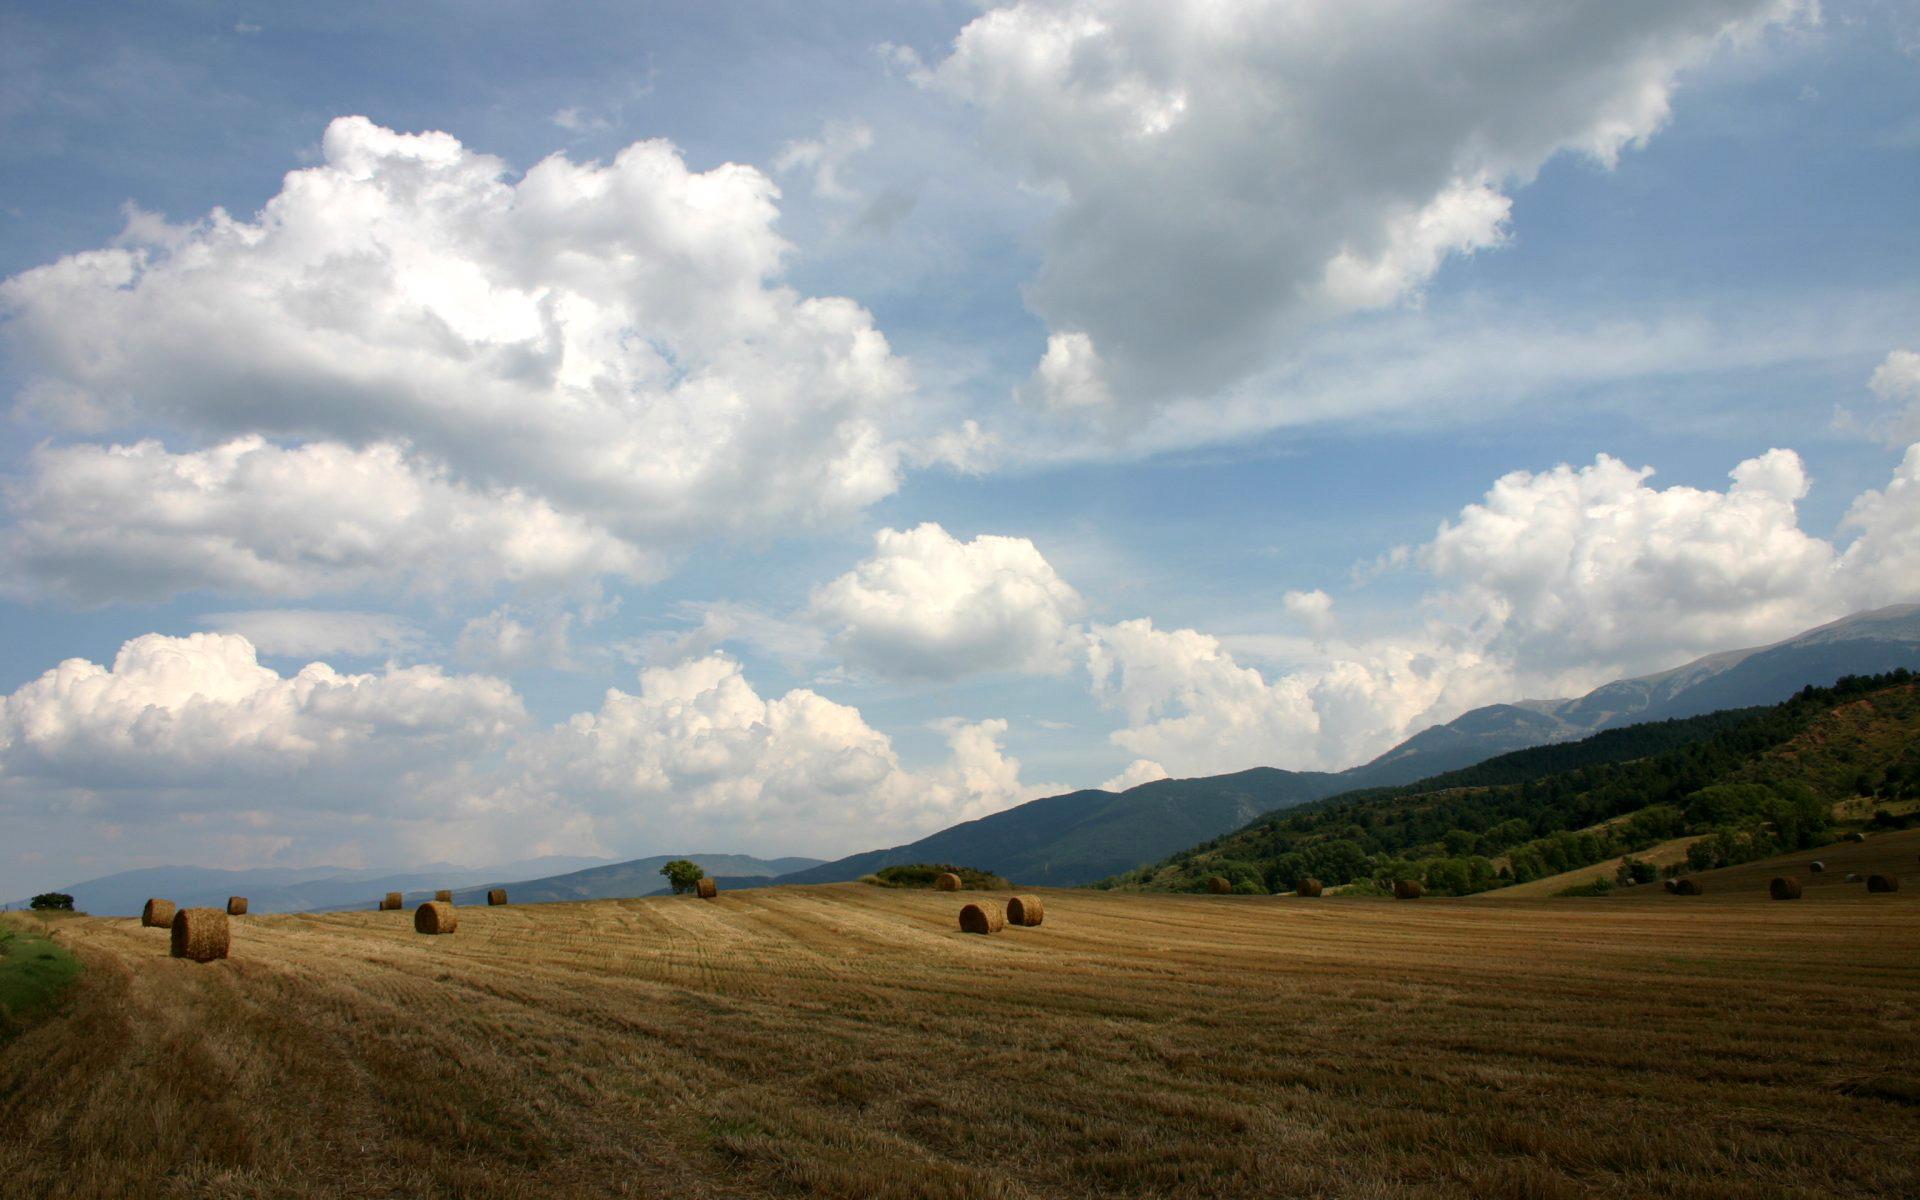 поле осеннее фото